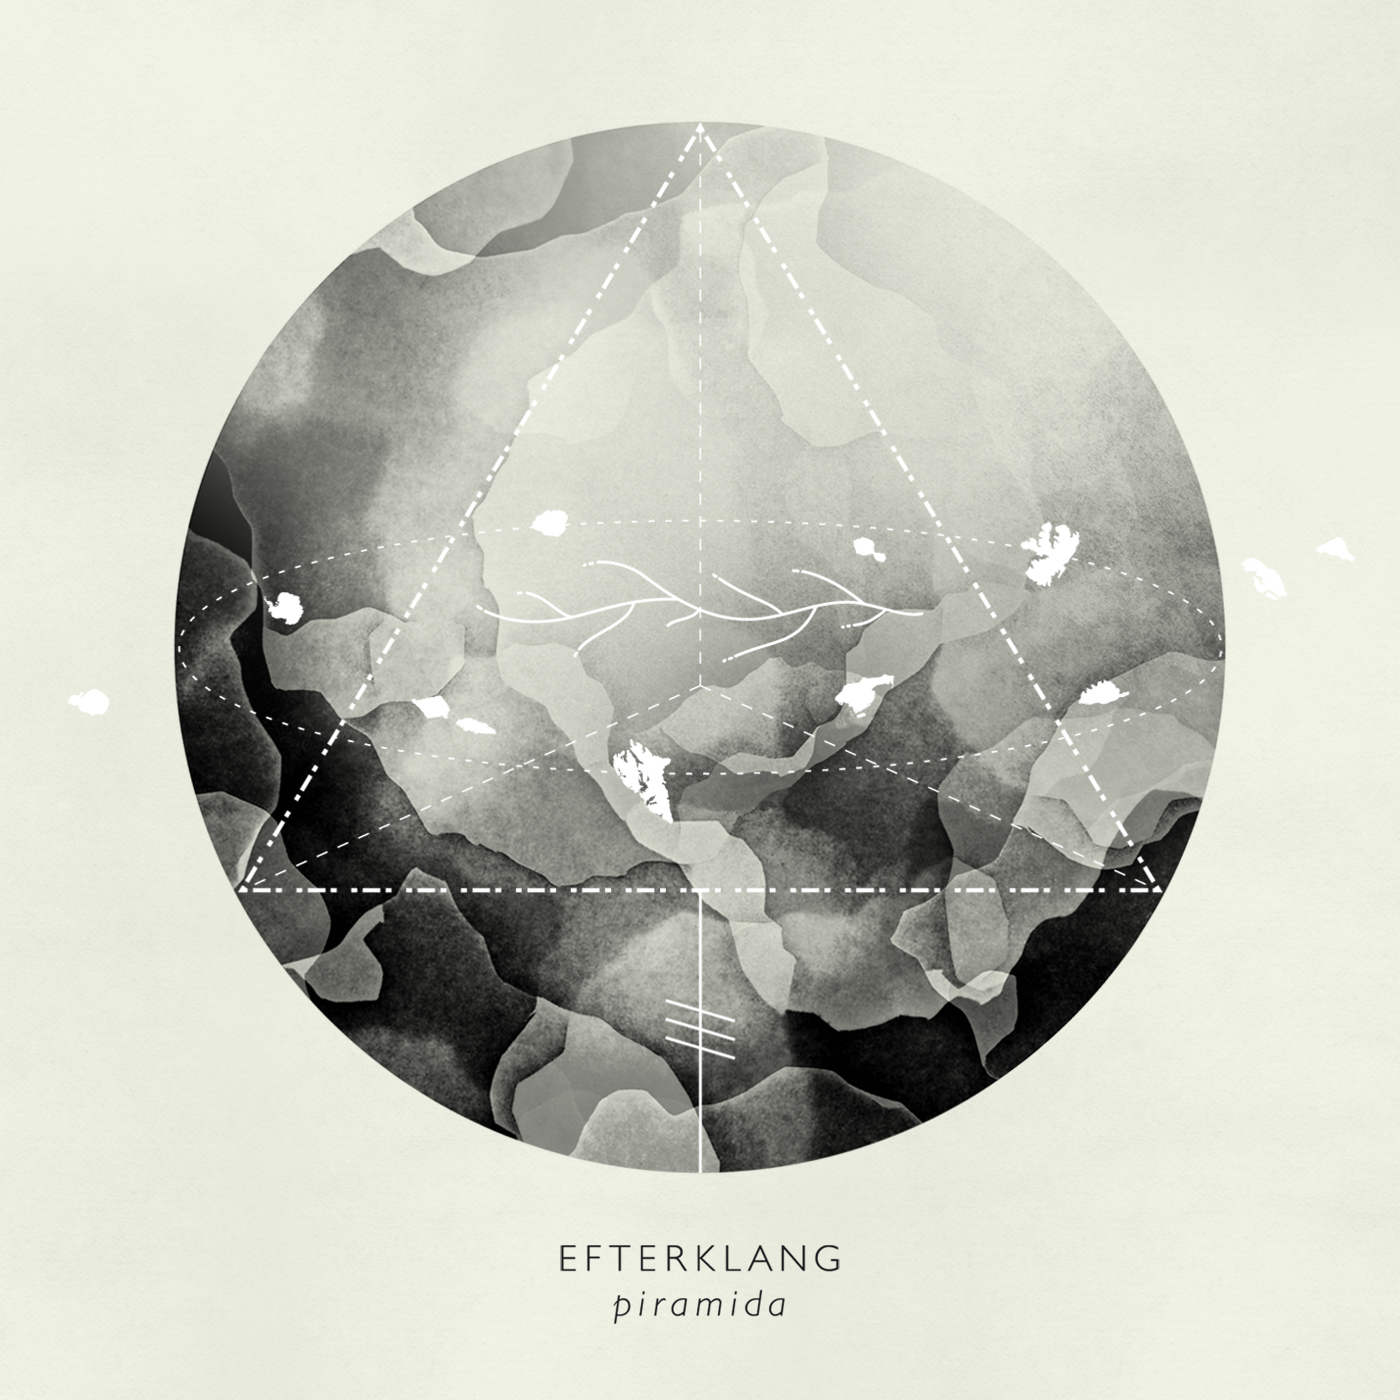 Piramida - 2012 - Efterklang(album)